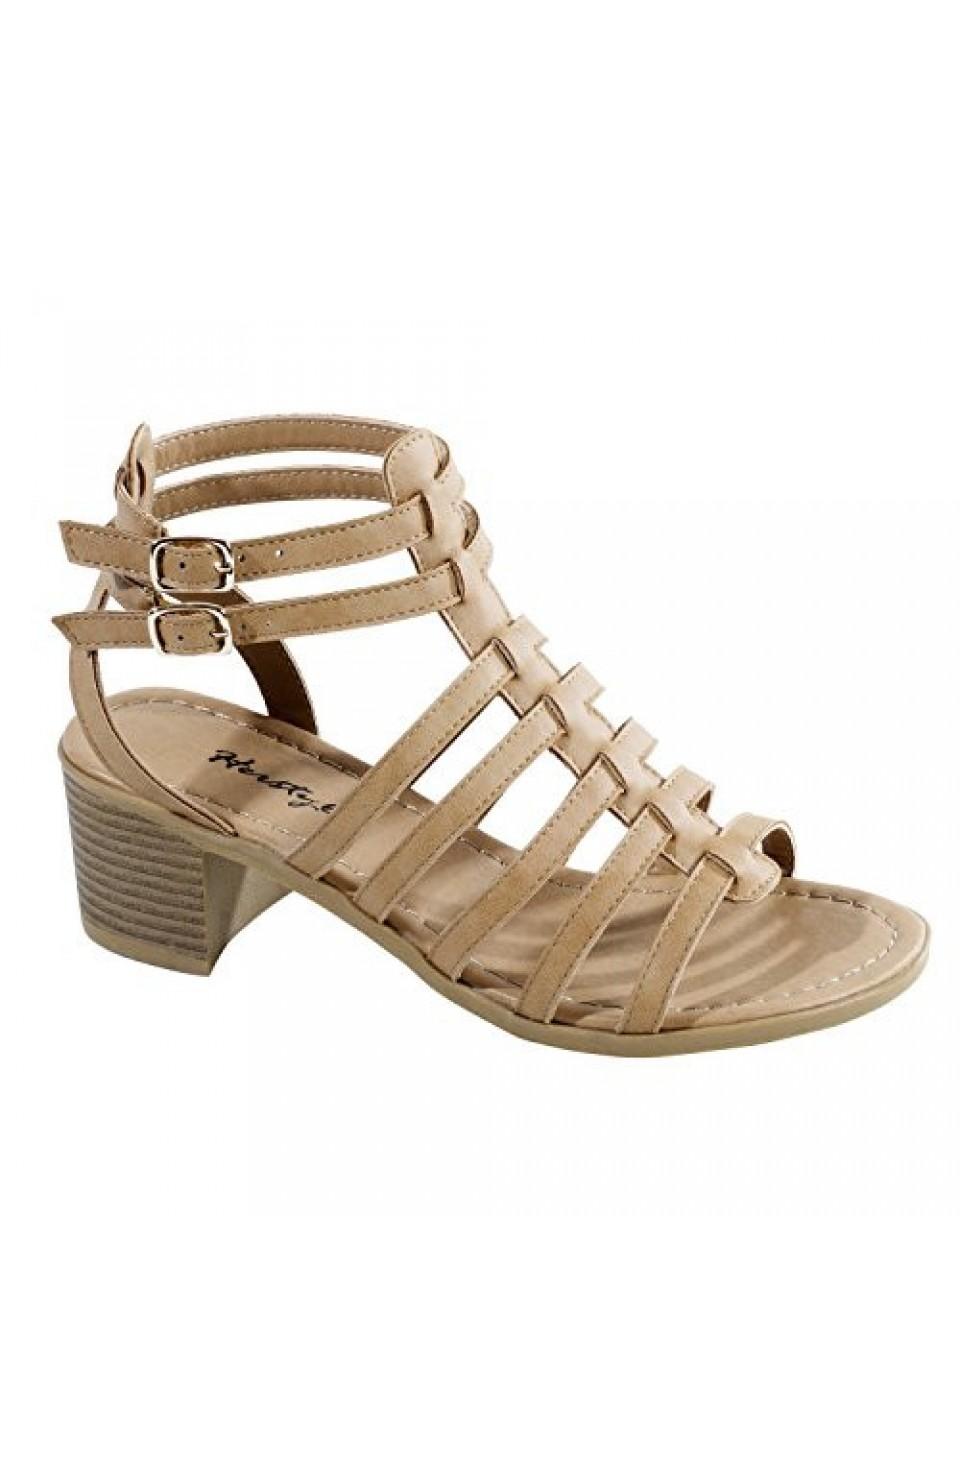 Women's Camel Giusti Manmade Gladiator-Style Heeled Sandal